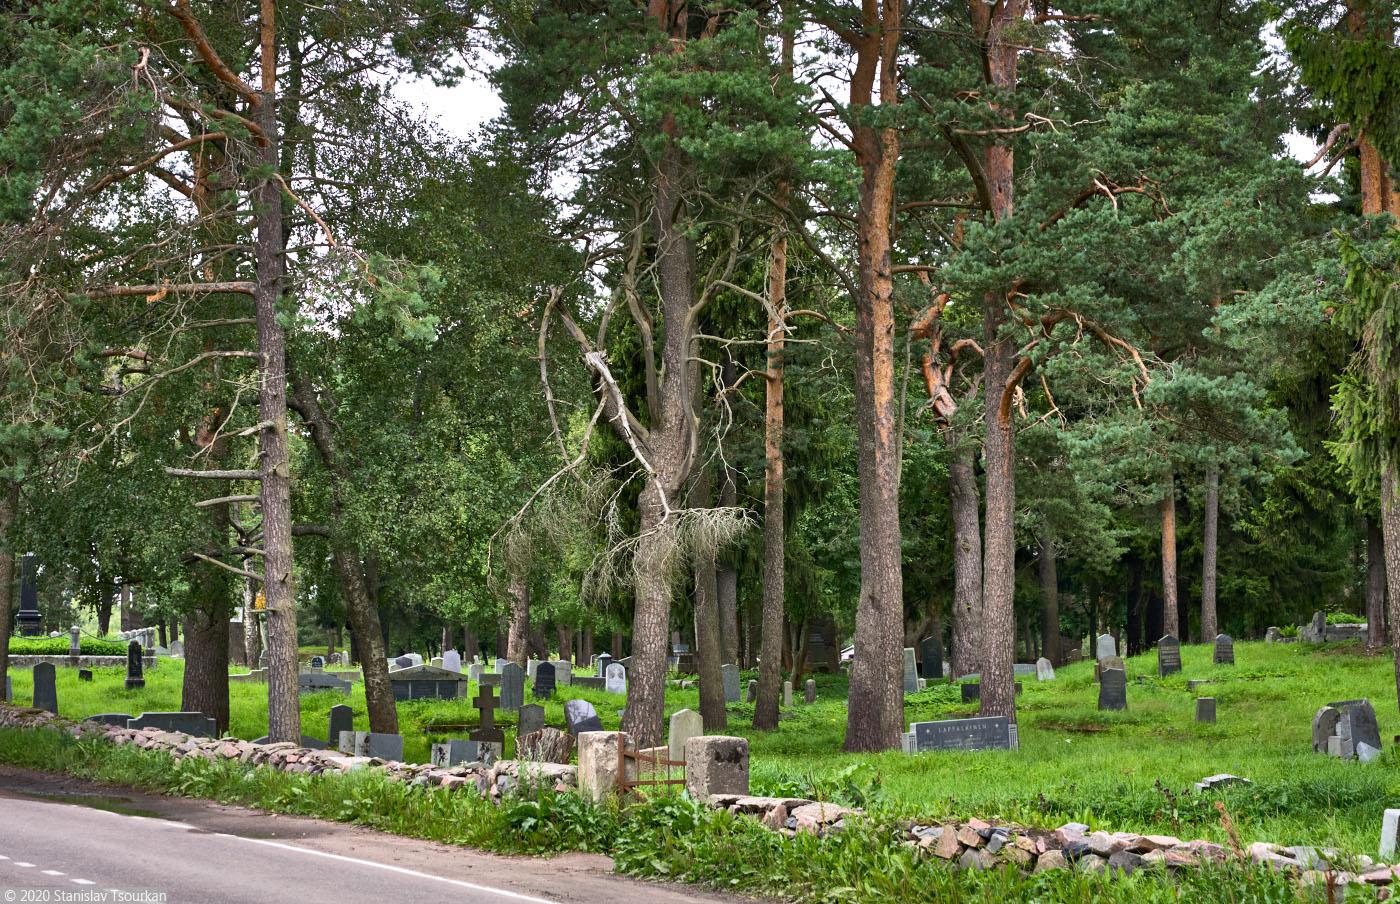 Карелия, республика Карелия, Сортавала, russia, karjala, sortavala, улица дружбы, финское кладбище